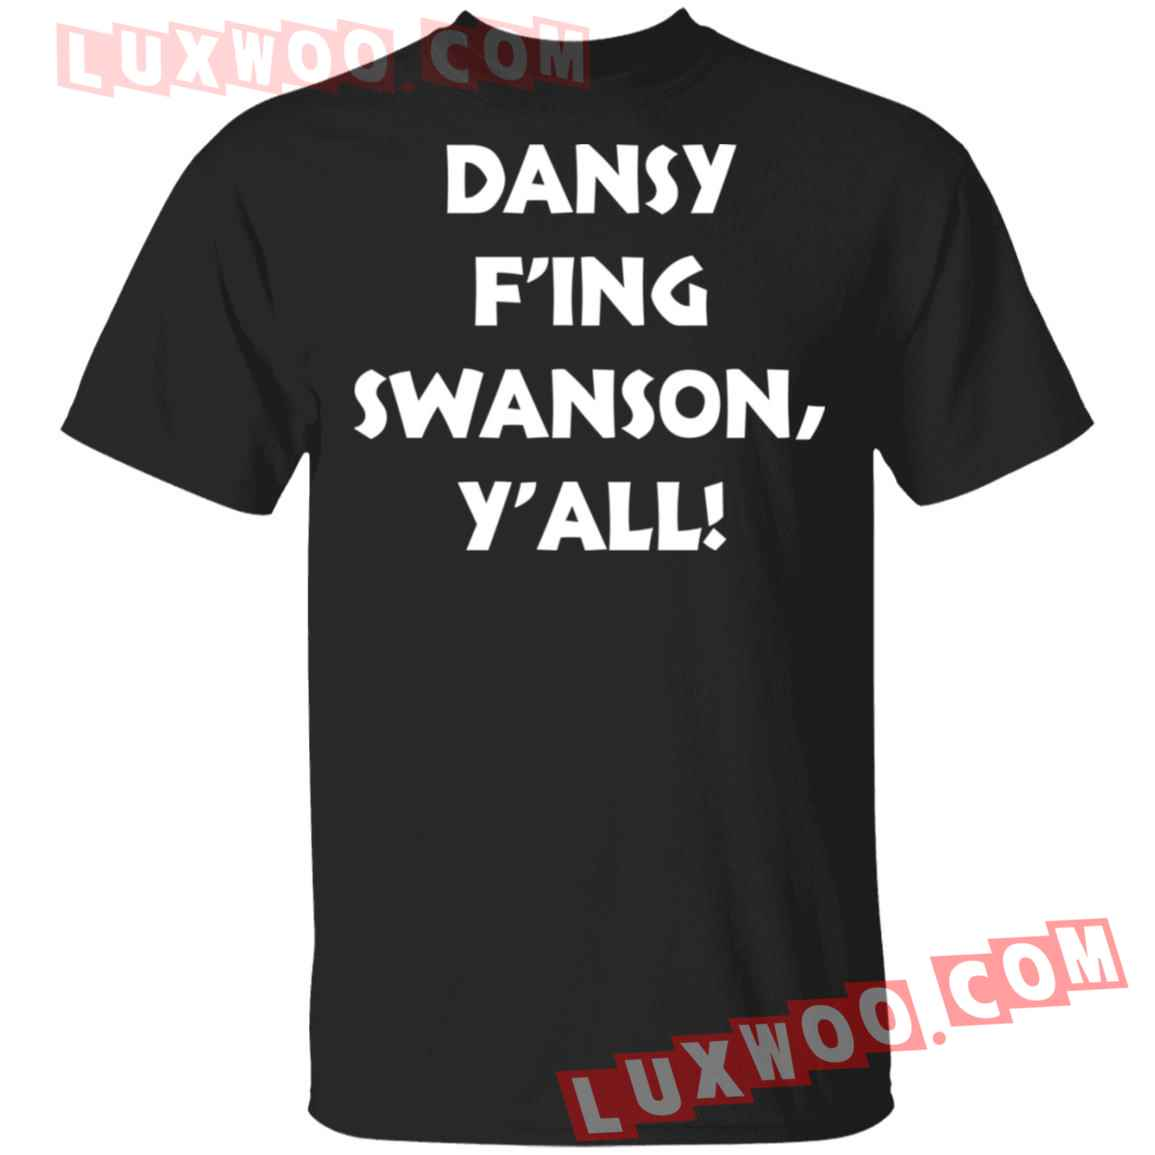 Dansy Fing Swanson Yall Shirt